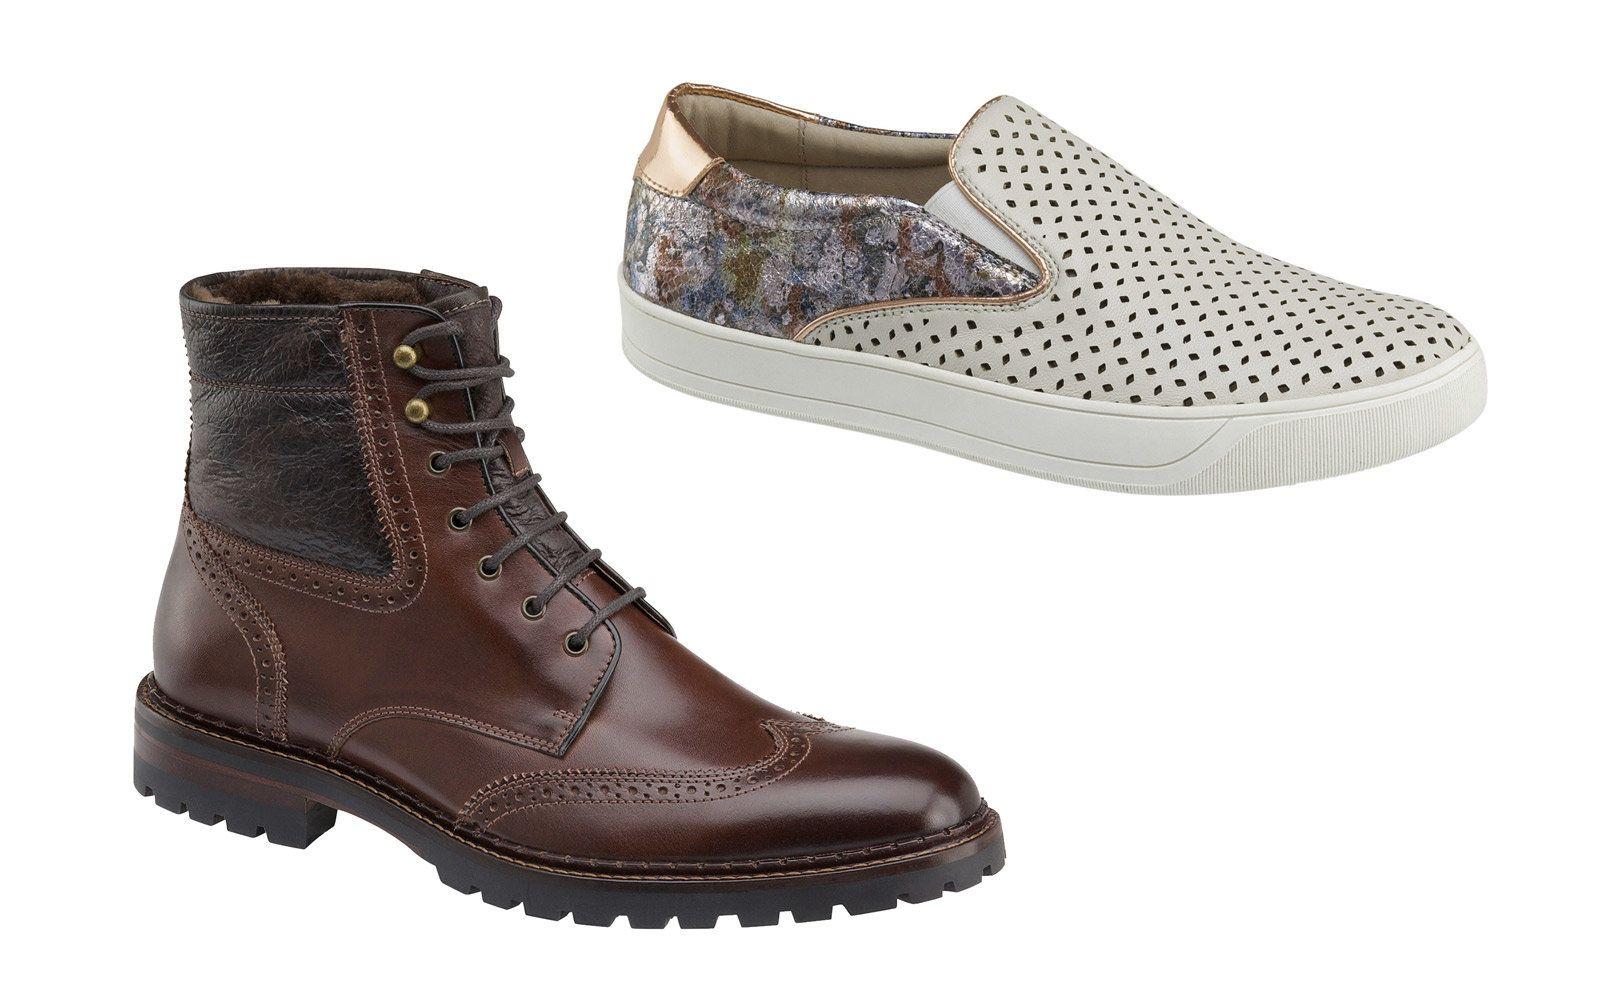 Comfy travel shoes, Shoe brands